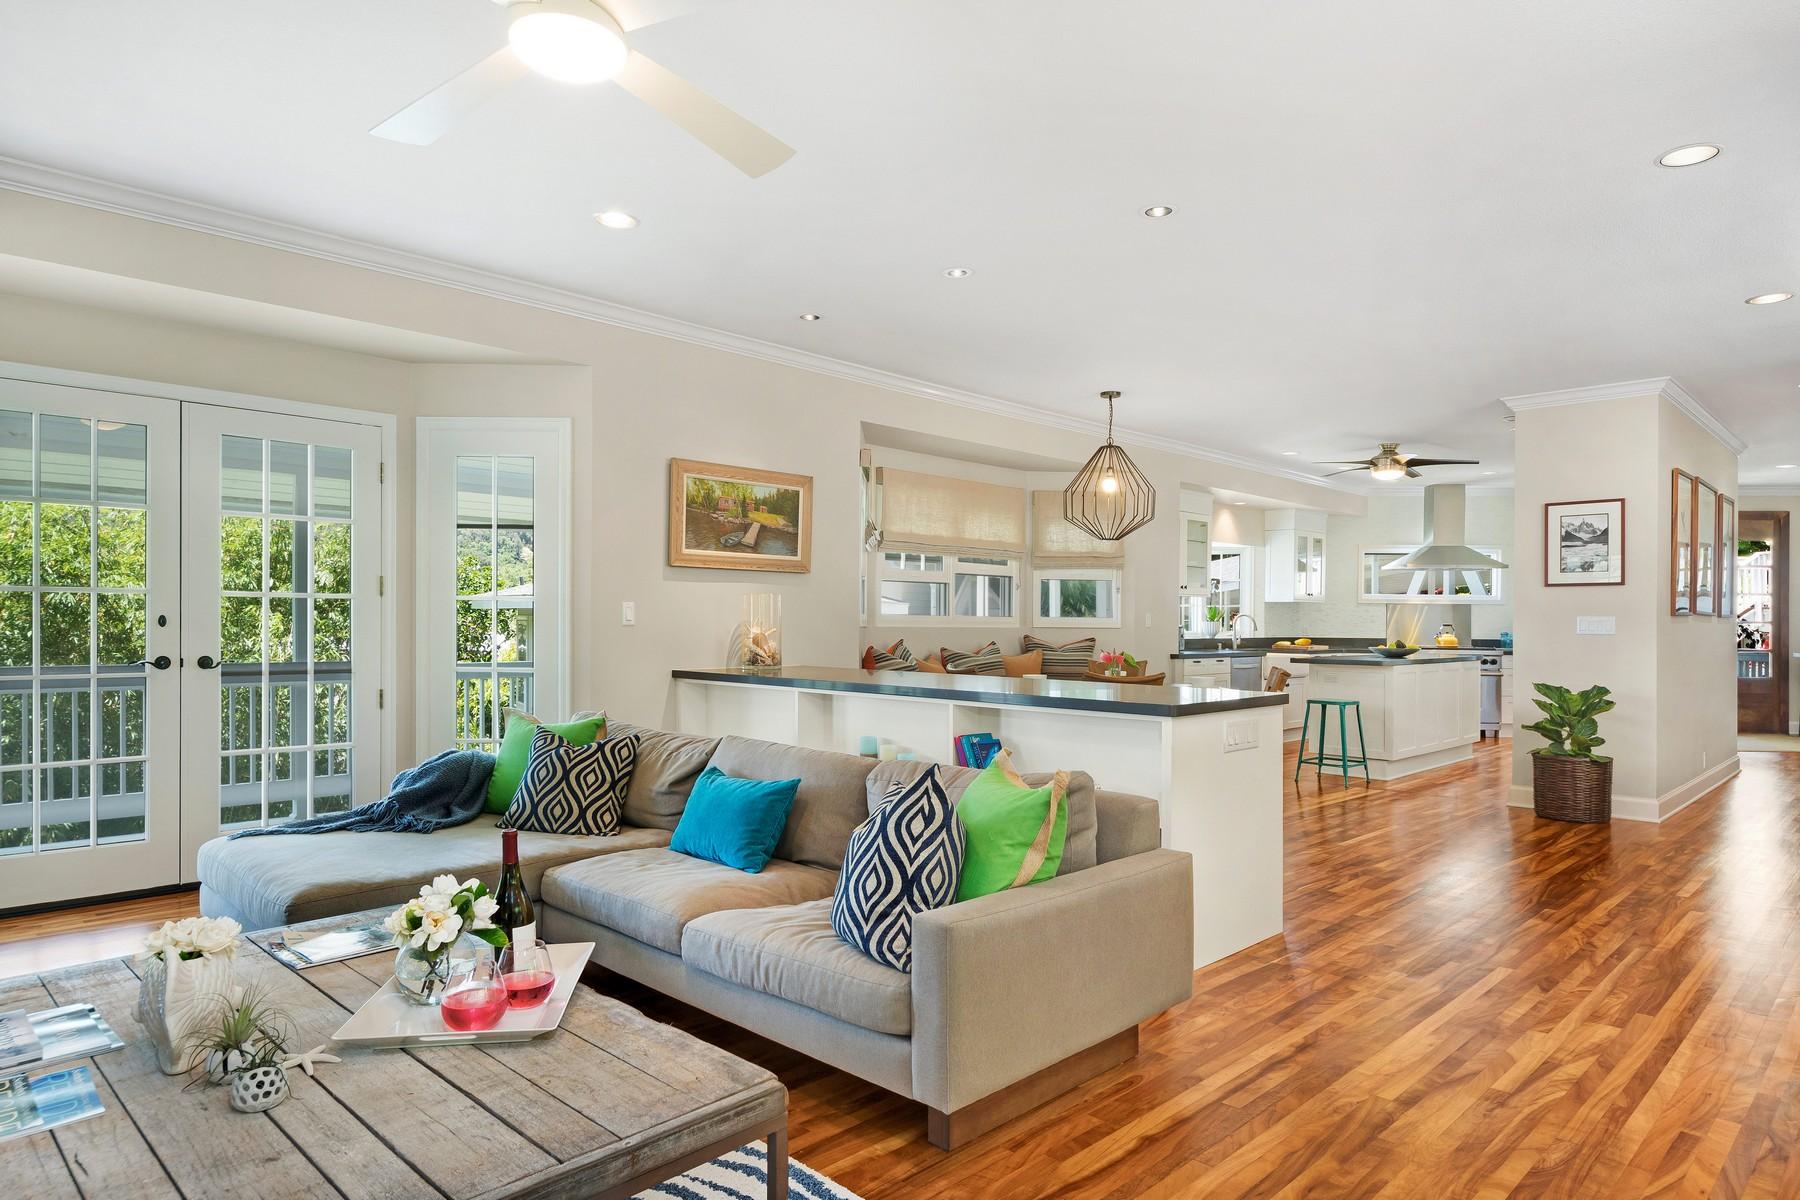 Single Family Home for Sale at Elegant Nuuanu Dowsett Estate 3005 Hoaloha Pl Honolulu, Hawaii 96817 United States